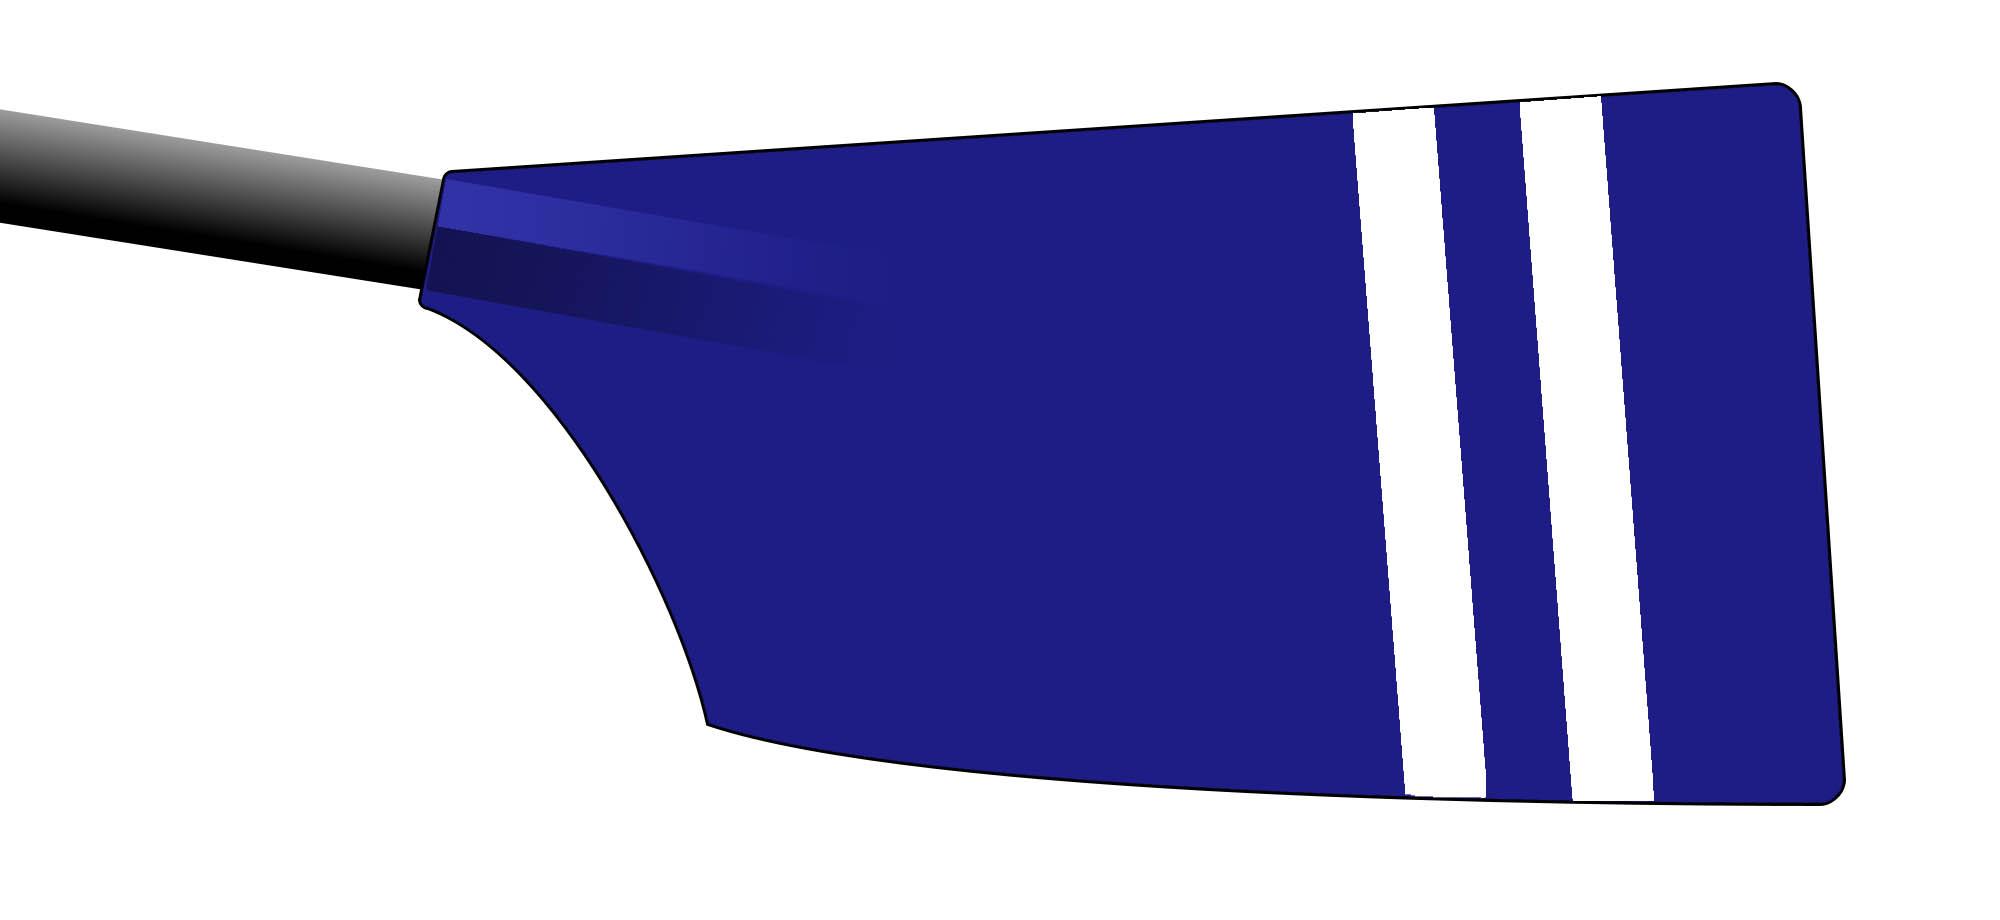 File Runcorn Rowing Club Blade Jpg Wikimedia Commons